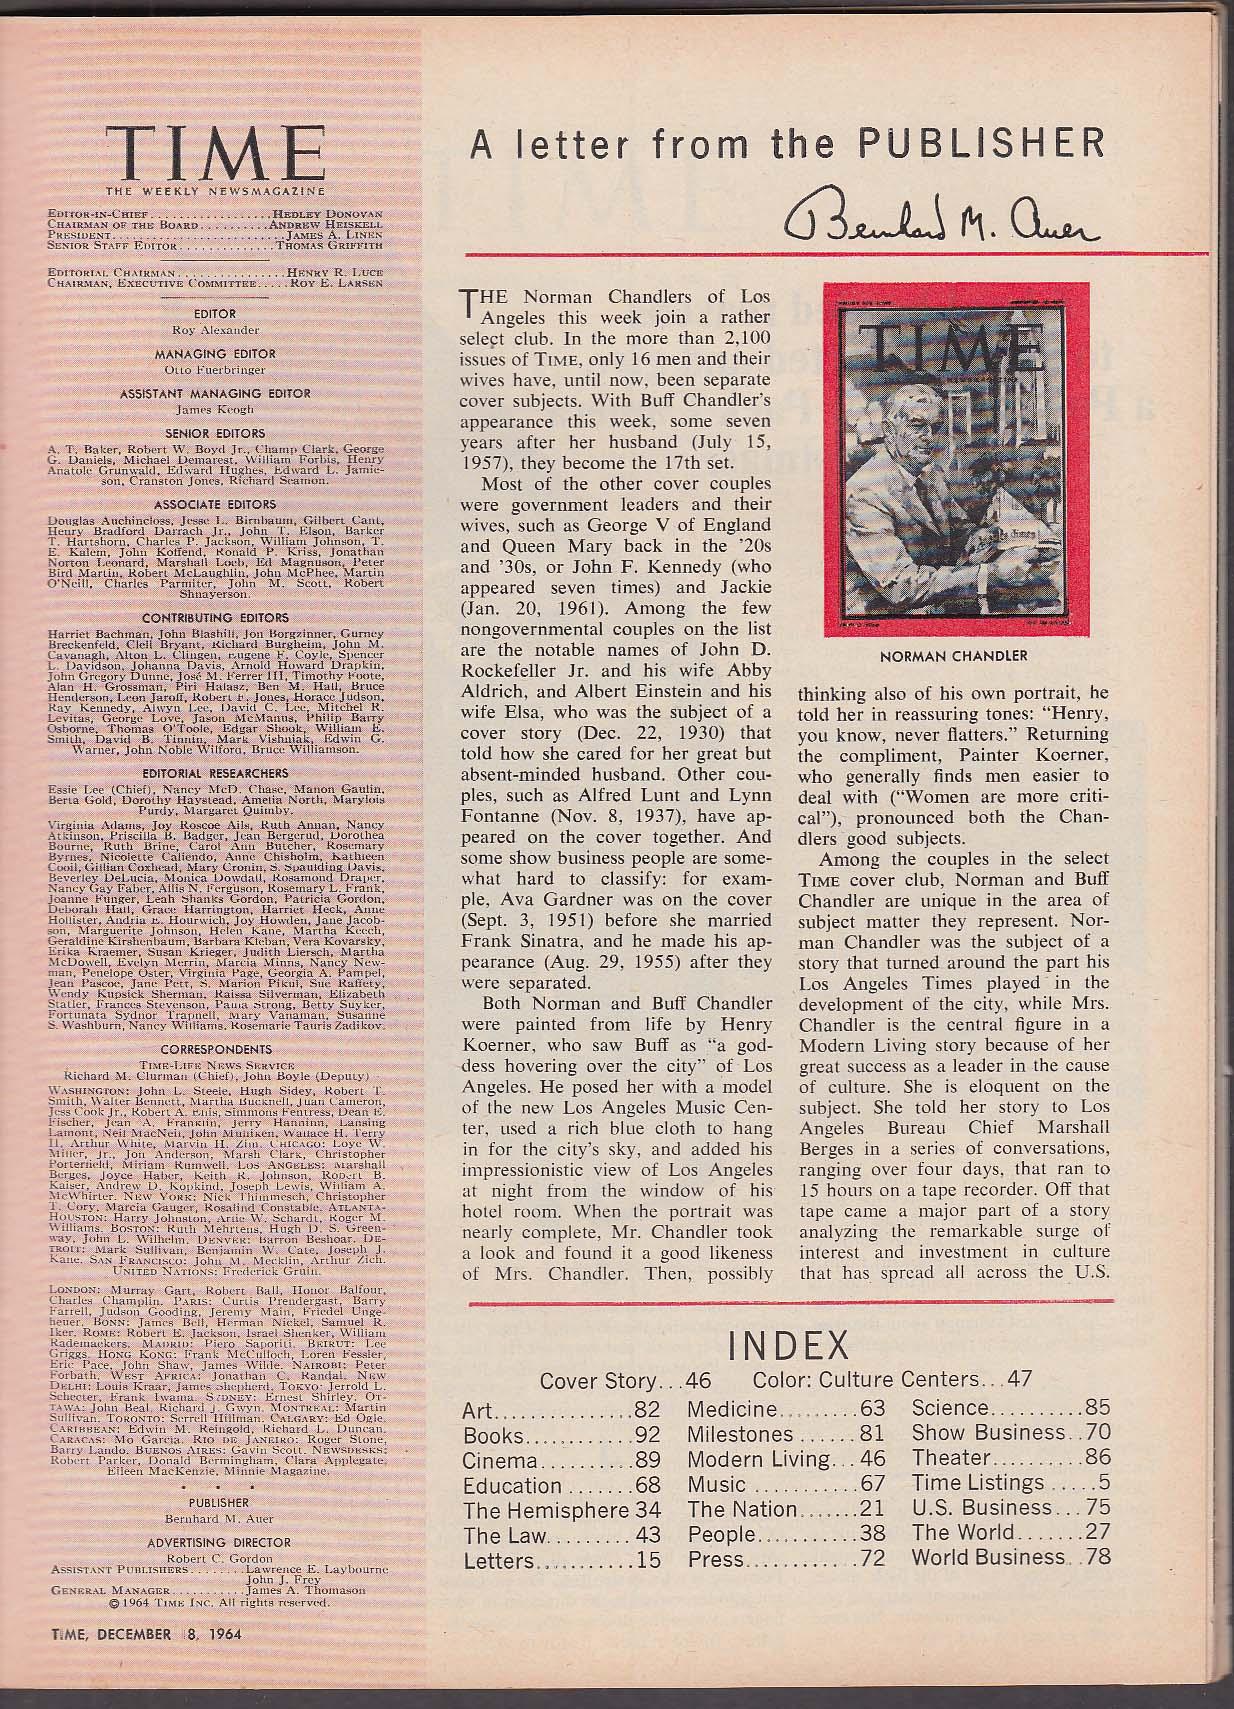 Image for TIME Los Angeles Buff Chandler Martin Luther King LBJ McNamara Congo 12/18 1964